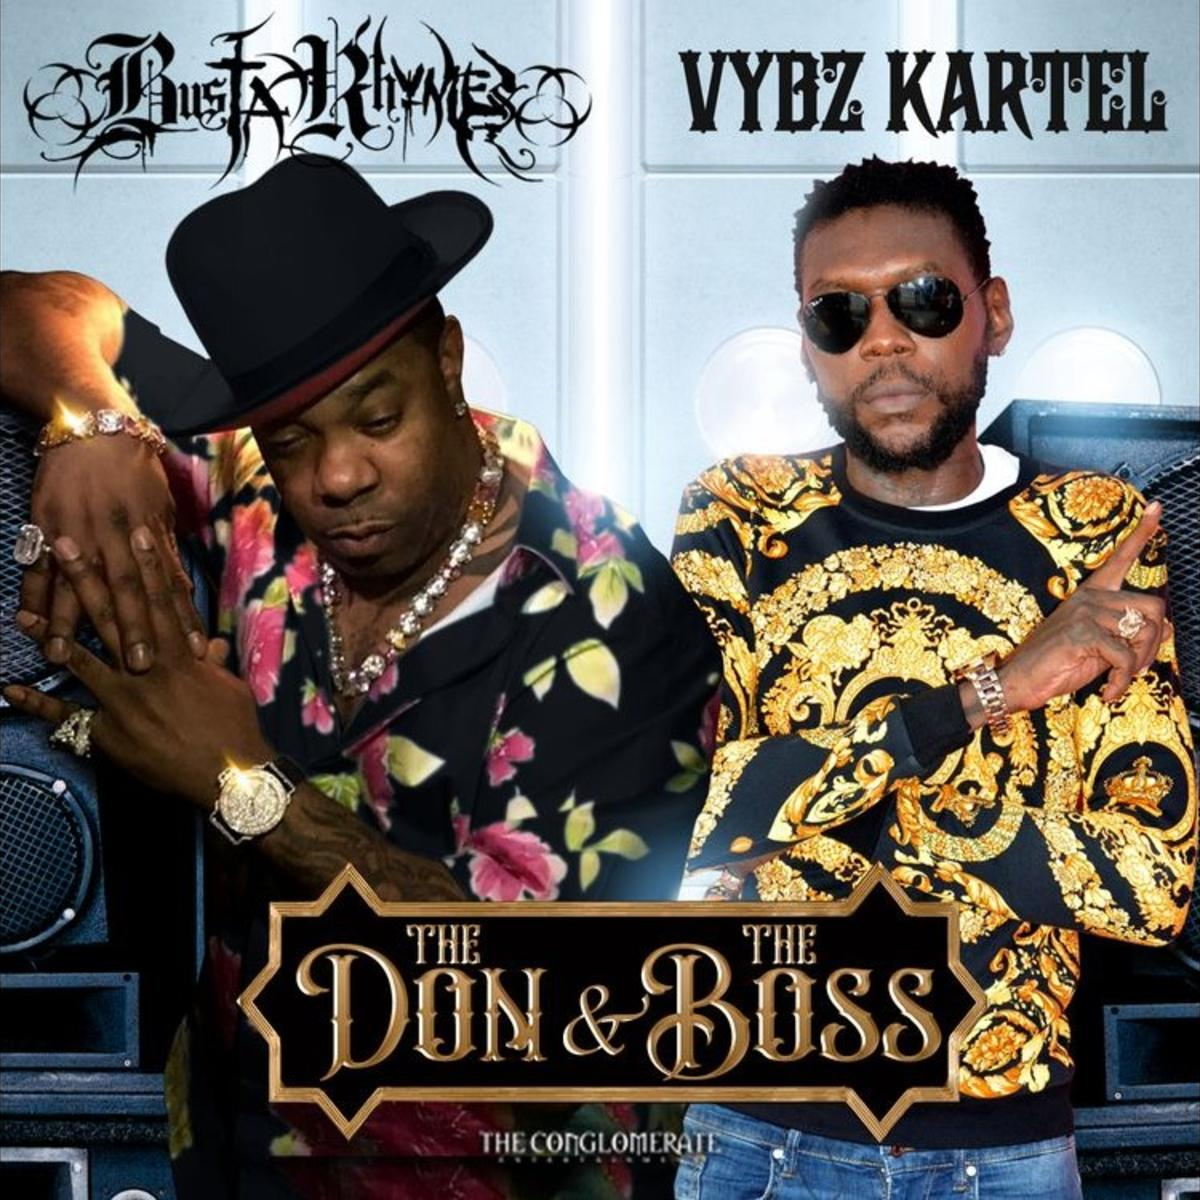 Busta Rhymes and Vybz Kartel